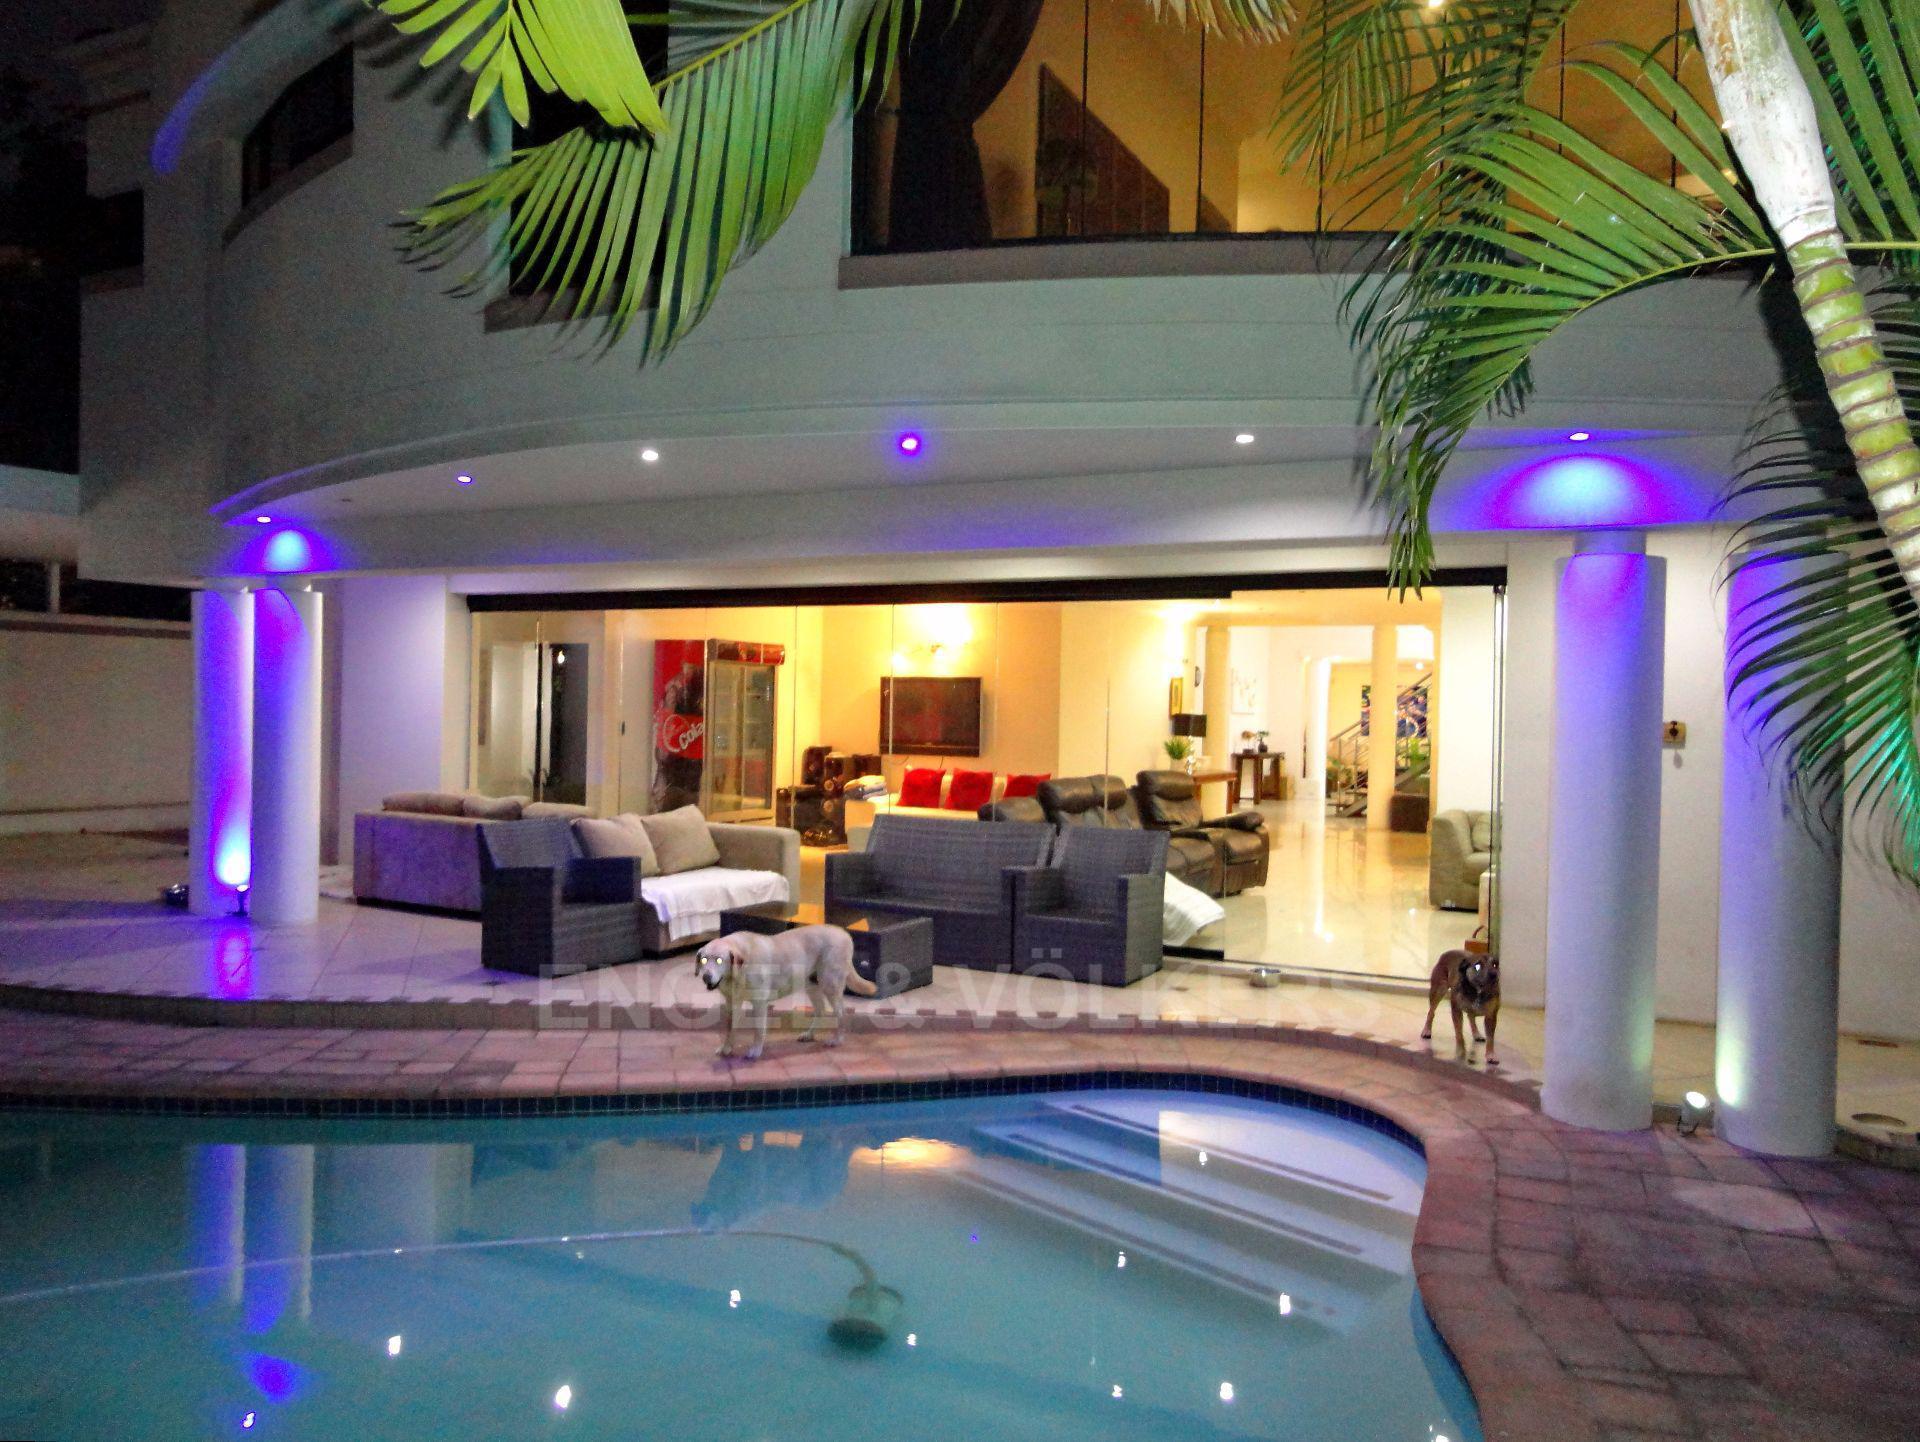 Durban North, Glenashley Property  | Houses For Sale Glenashley, GLENASHLEY, House 6 bedrooms property for sale Price:7,900,000